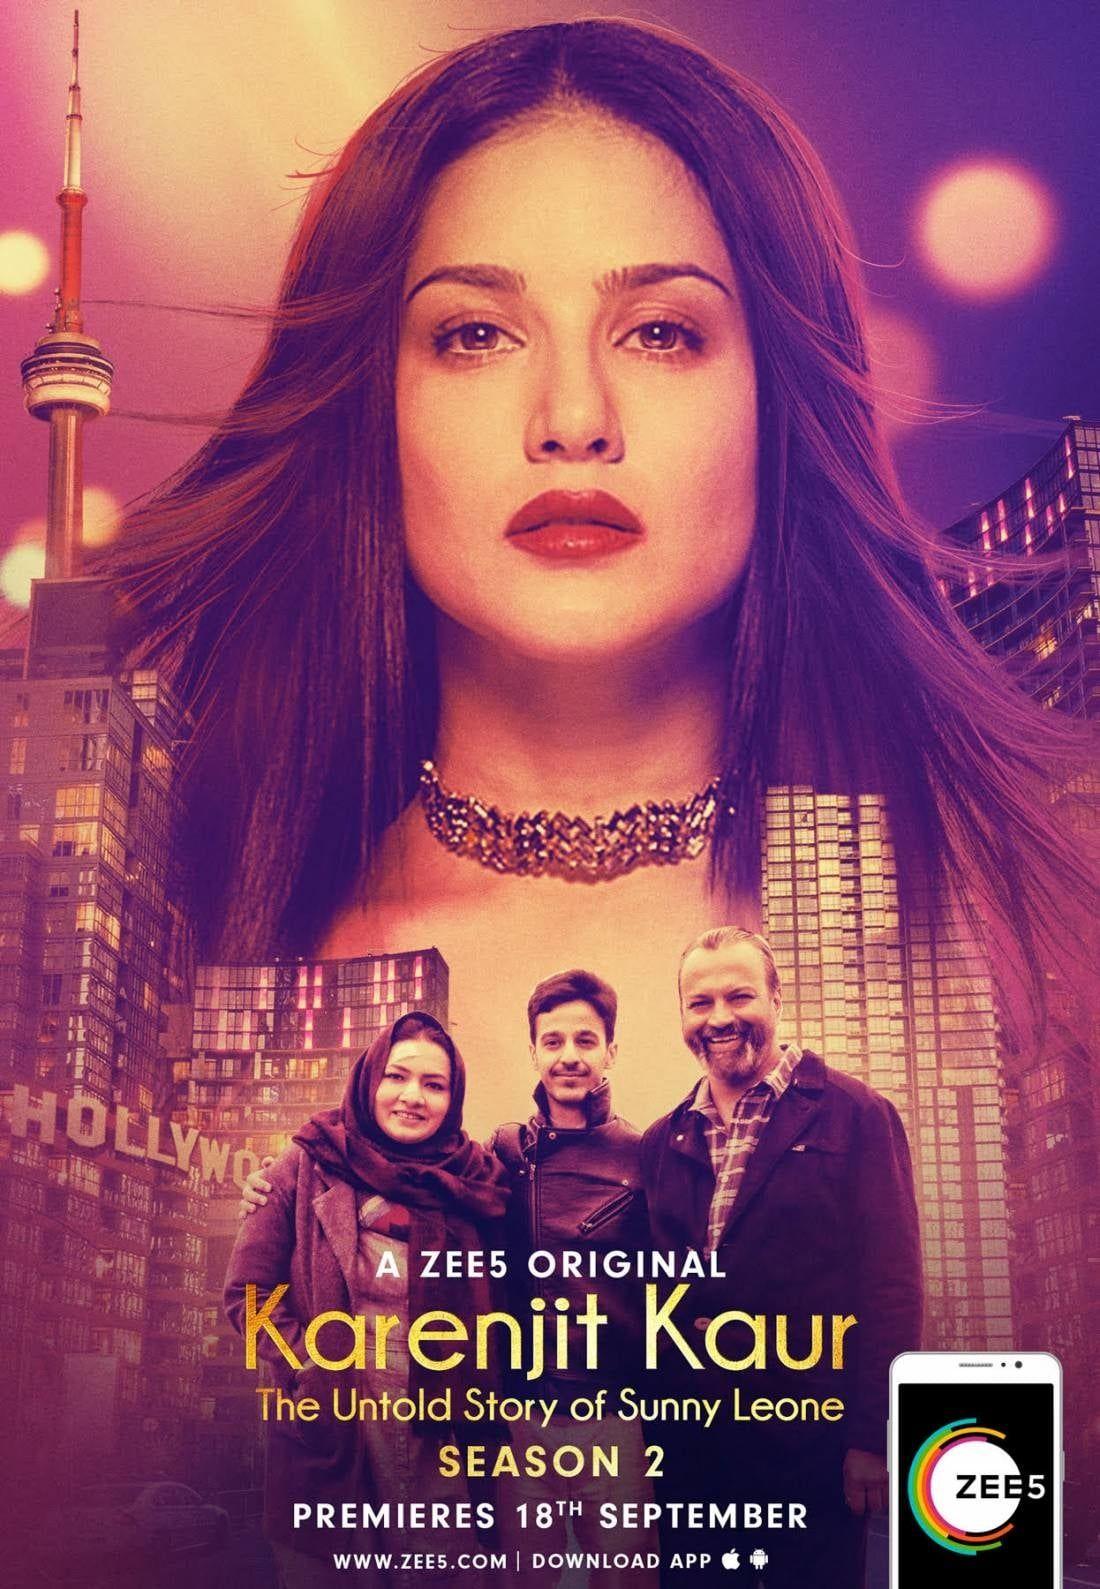 Karenjit Kaur Season 2 all episodes download and watch